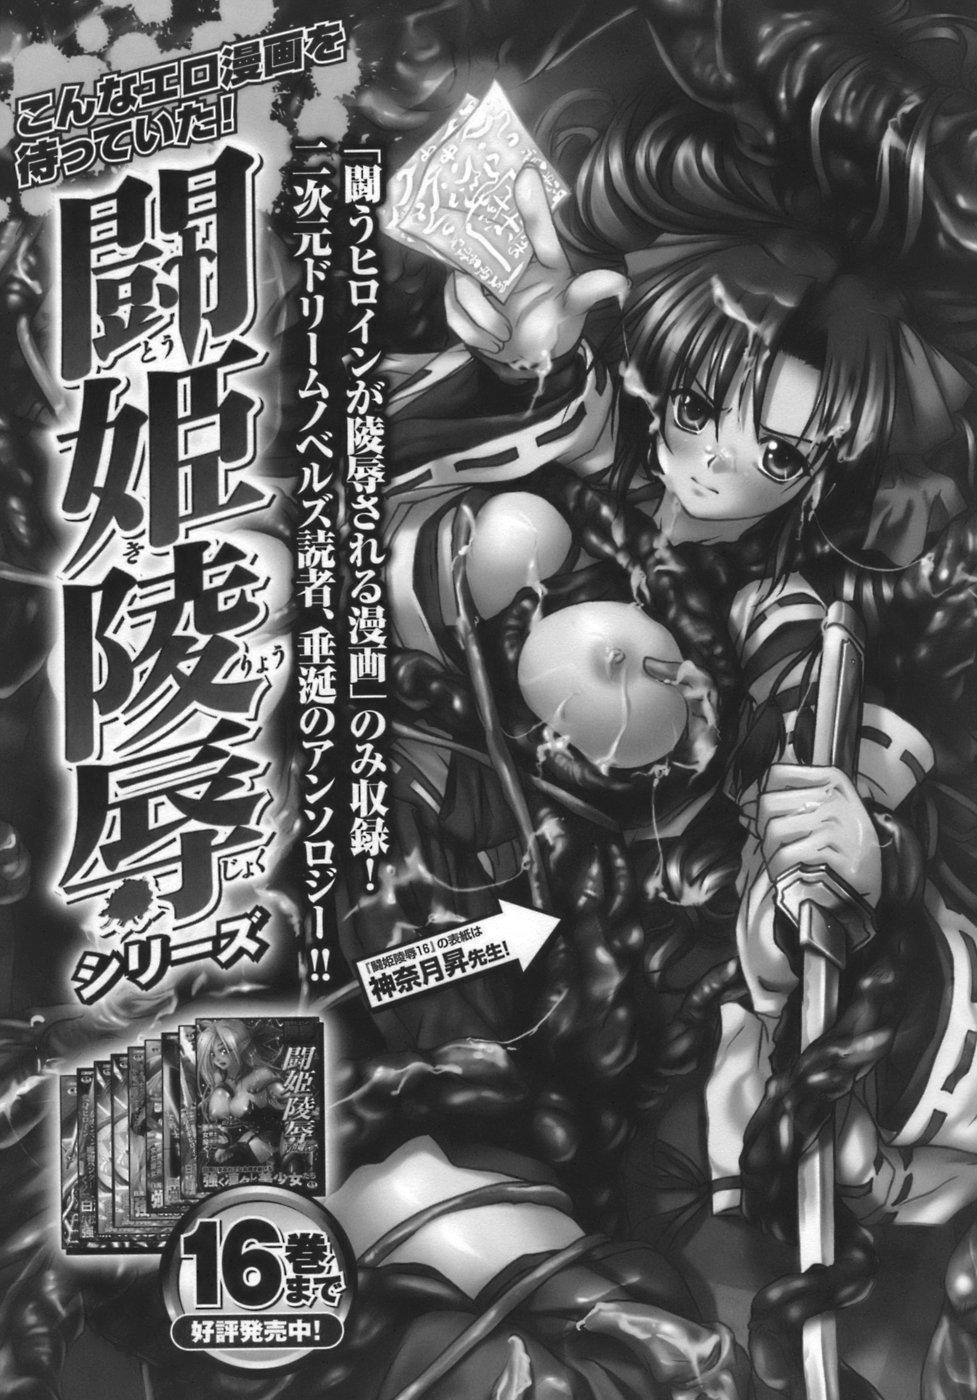 [Parfait] Datenshi-tachi no Chinkonka - Fallen Angels Requiem 157